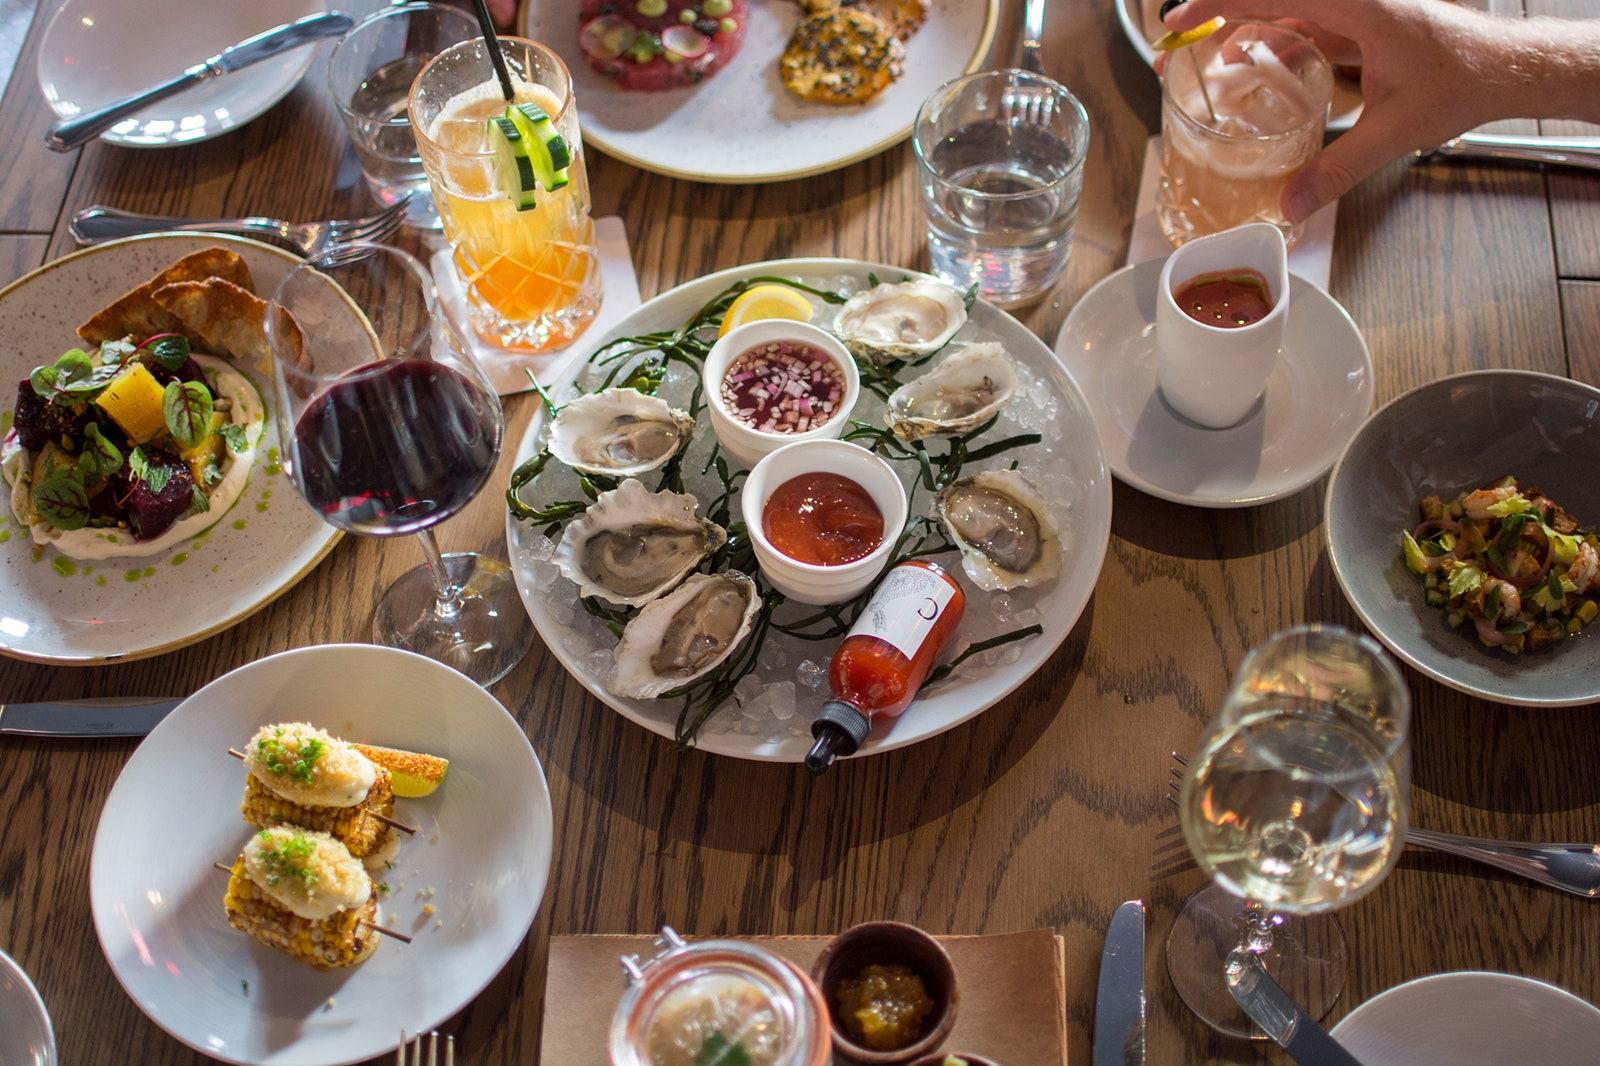 Orlando Popular Destinations for Food Lovers